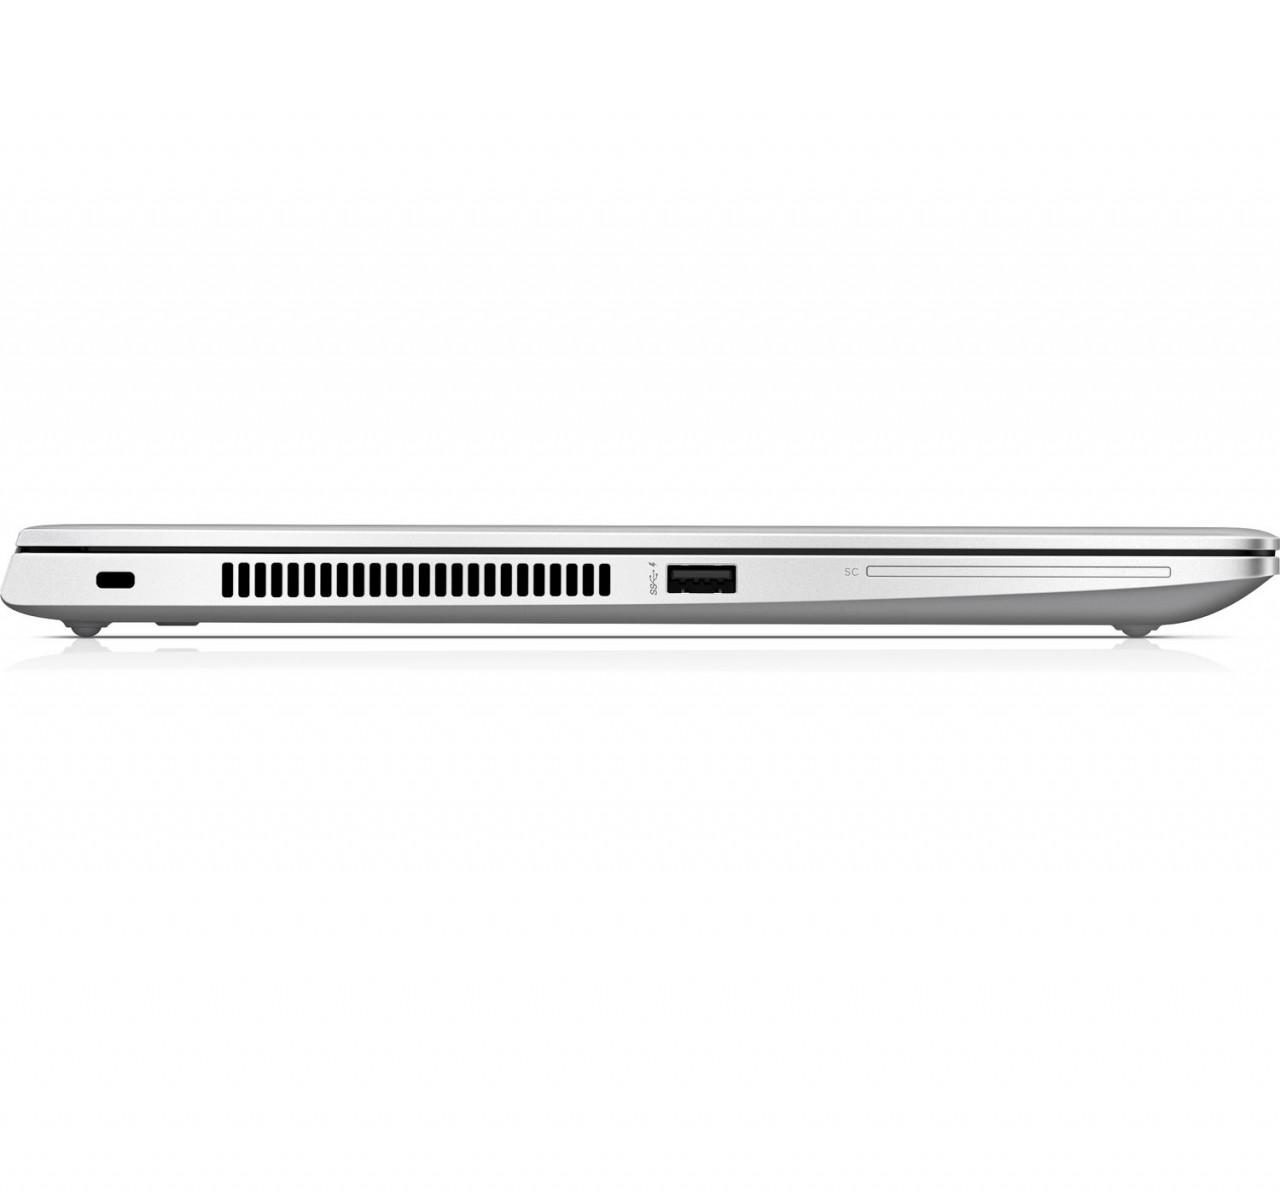 HP EliteBook 840 G5 Notebook 35,6 cm (14 Zoll) 1920 x 1080 Pixel Intel® Core™ i5 der siebten Generat